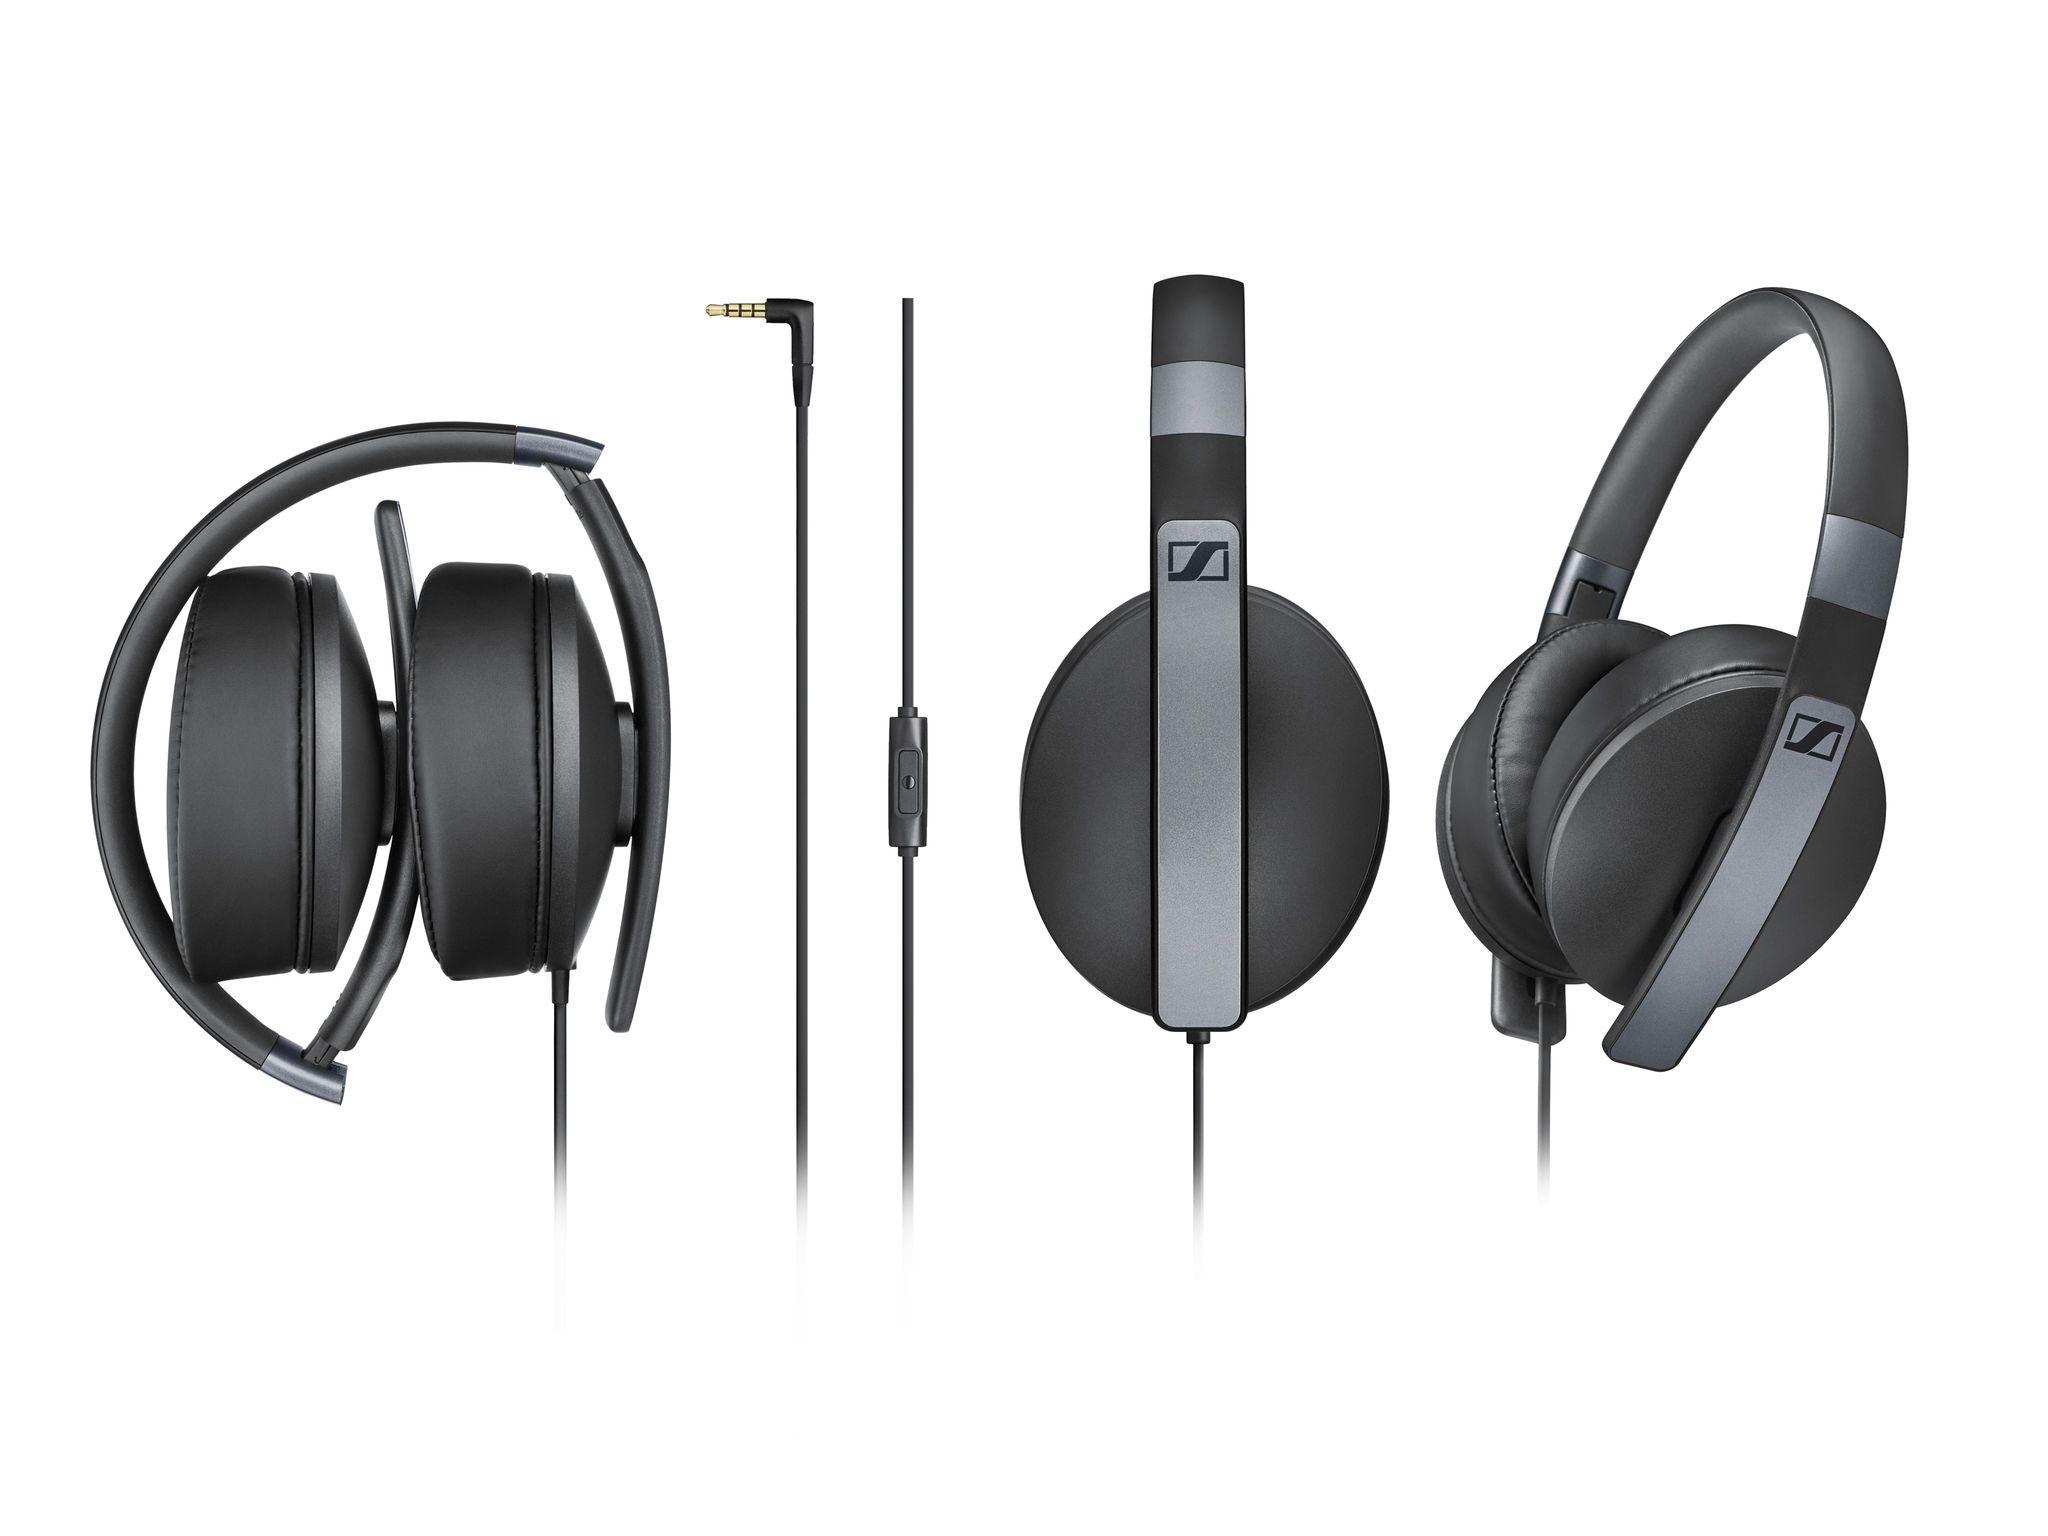 Sennheiser Hd 4 Series Headphones Design Sennheiser Headphone